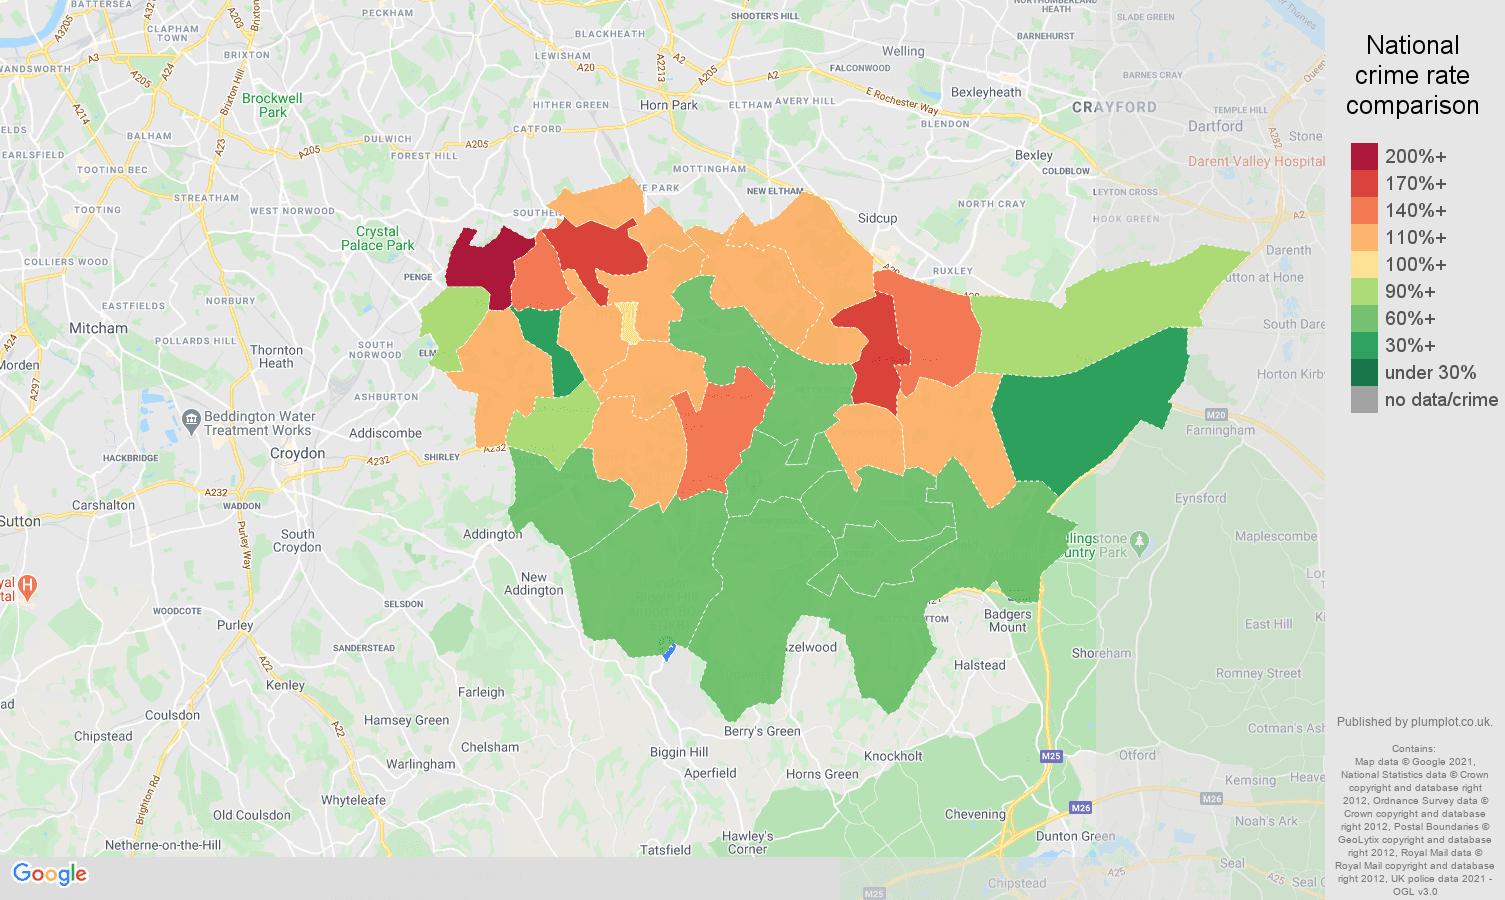 Bromley antisocial behaviour crime rate comparison map